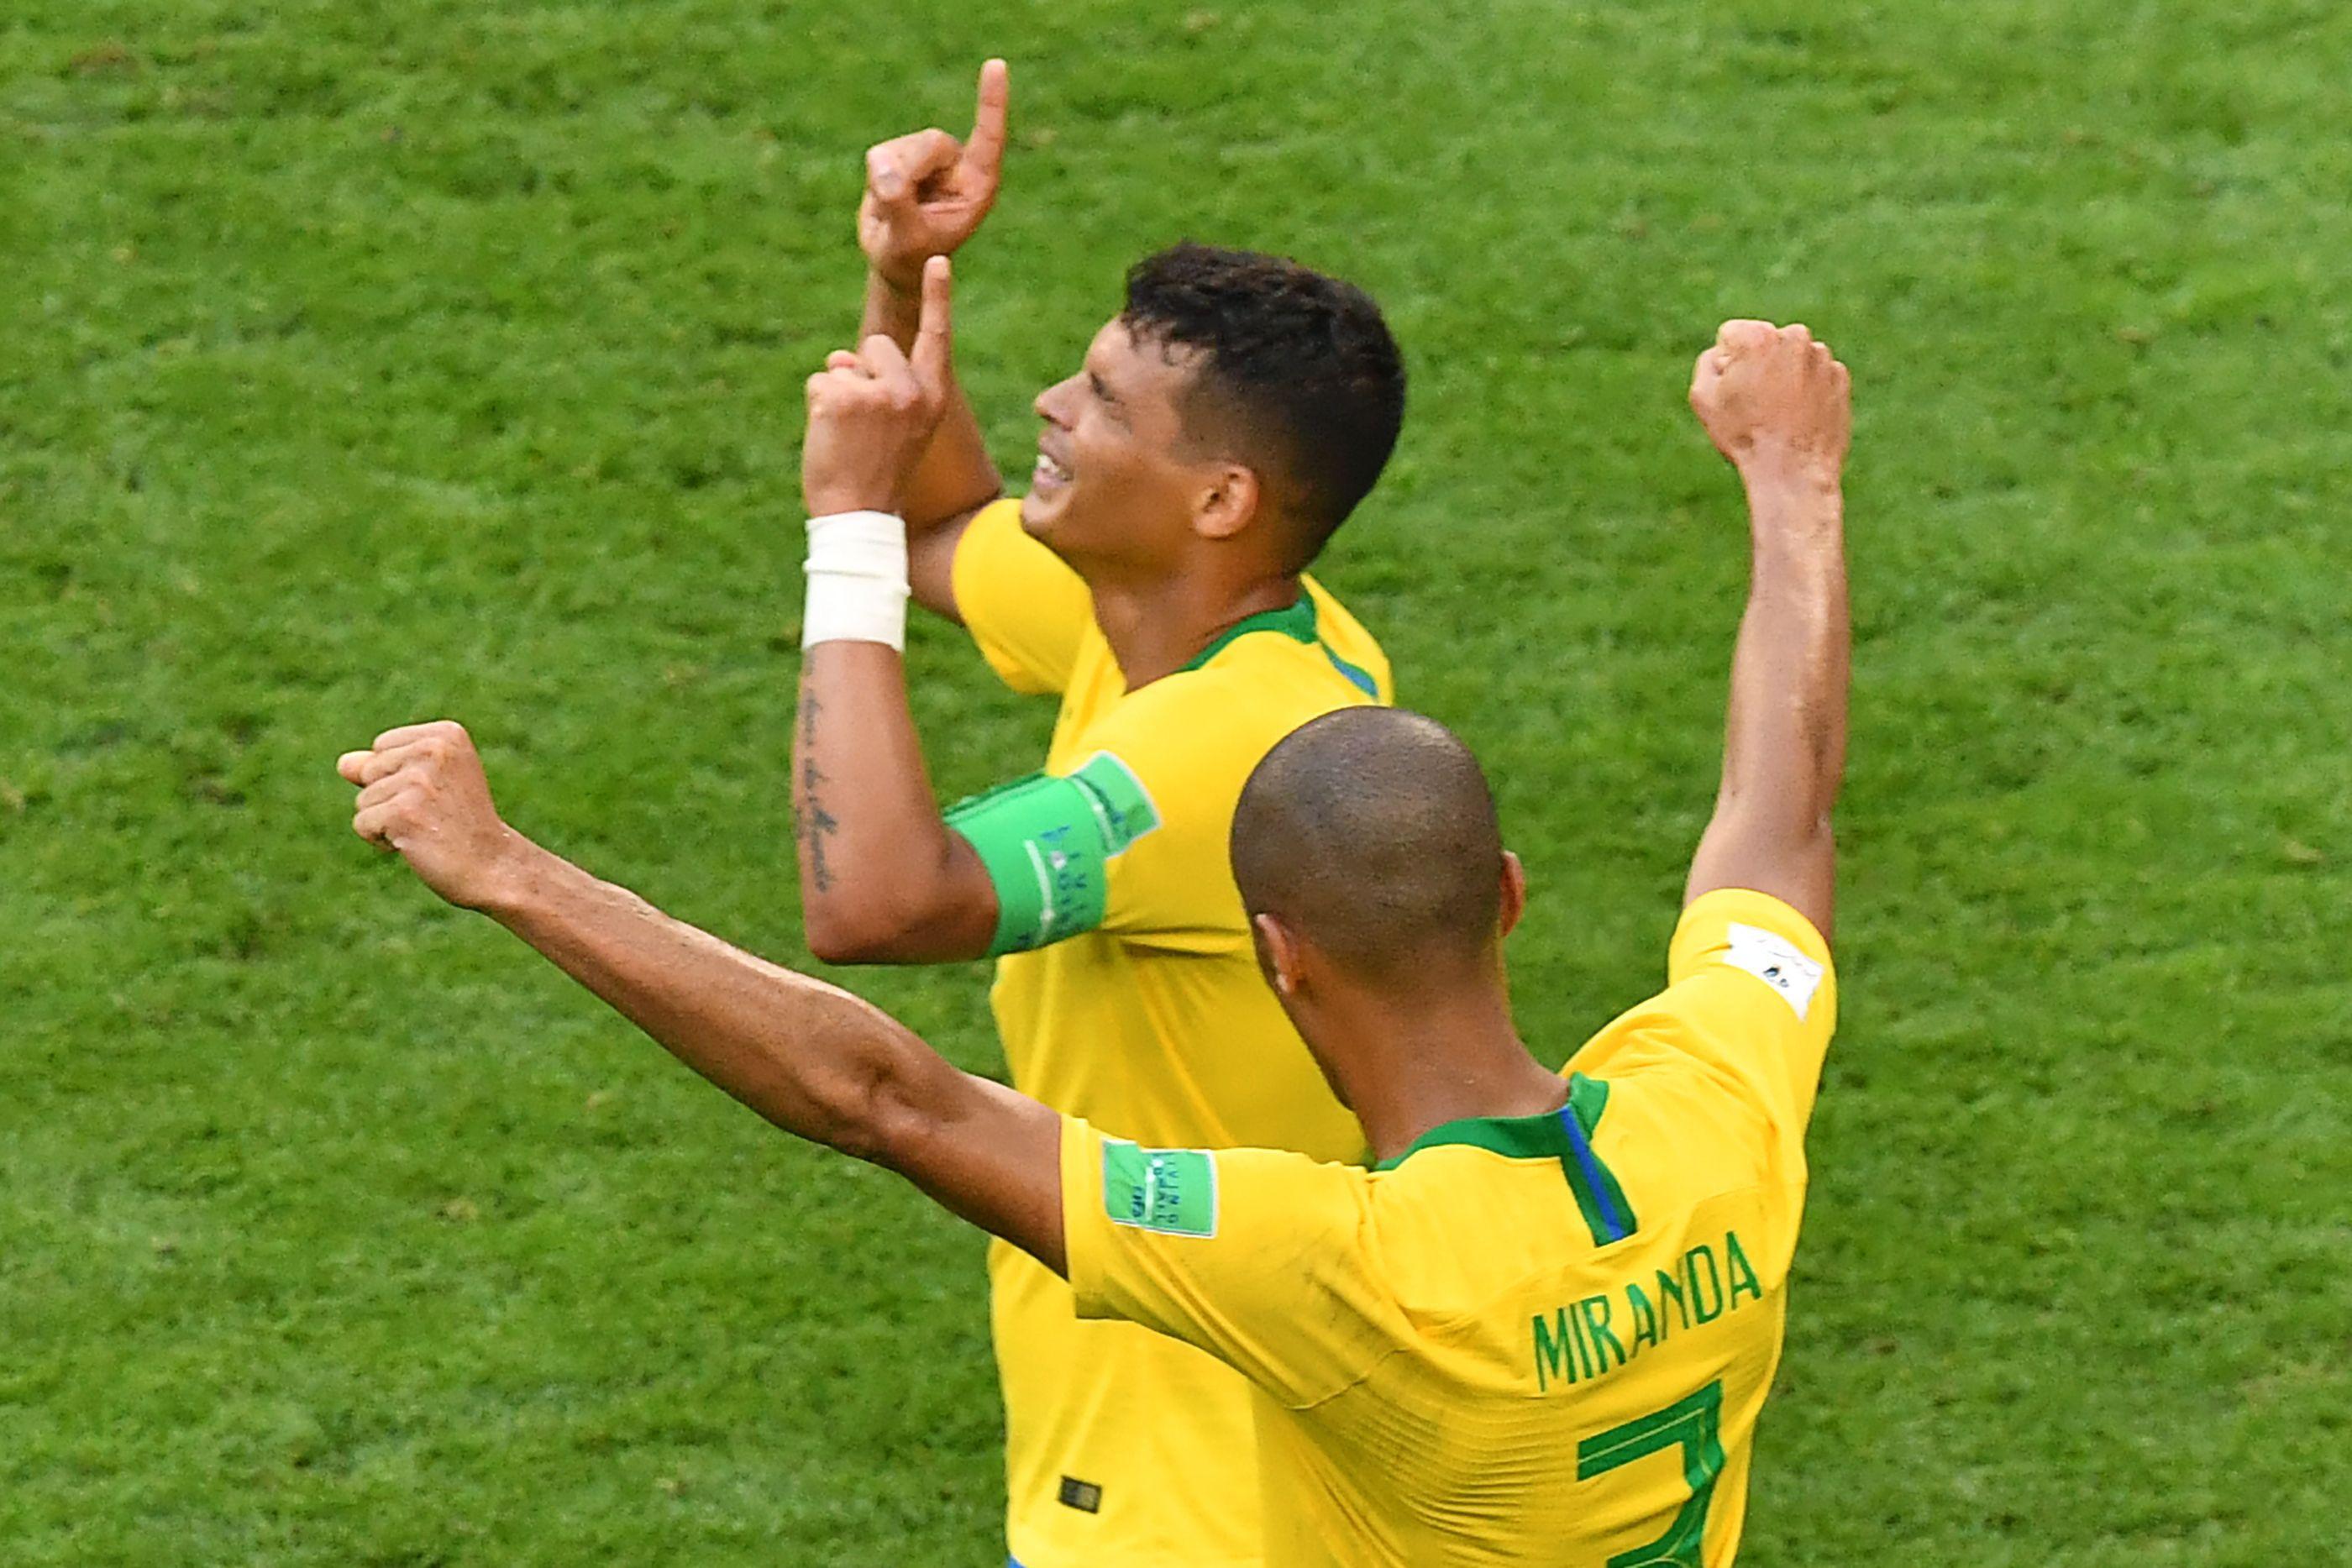 The Brazilian Tarkowski and Mee